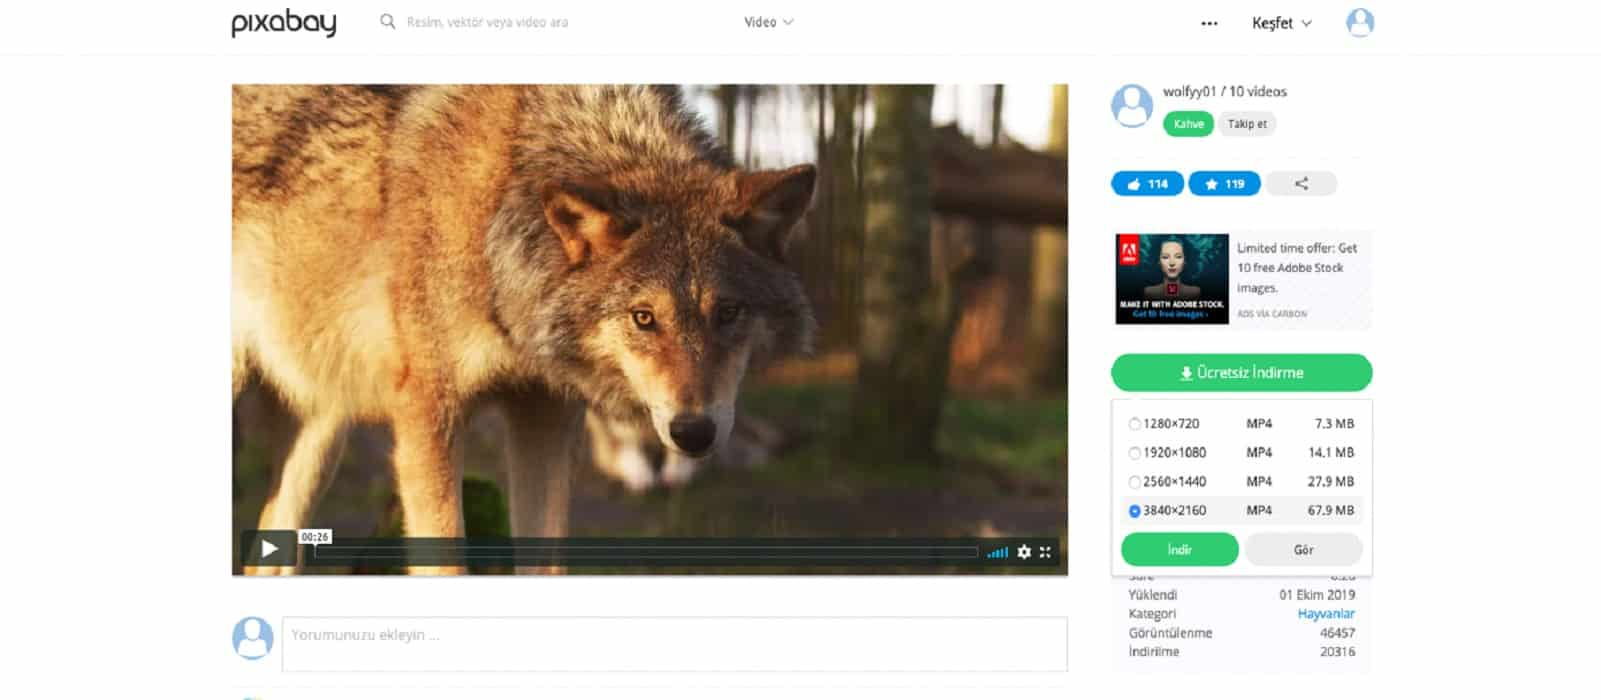 pixabay video mp4